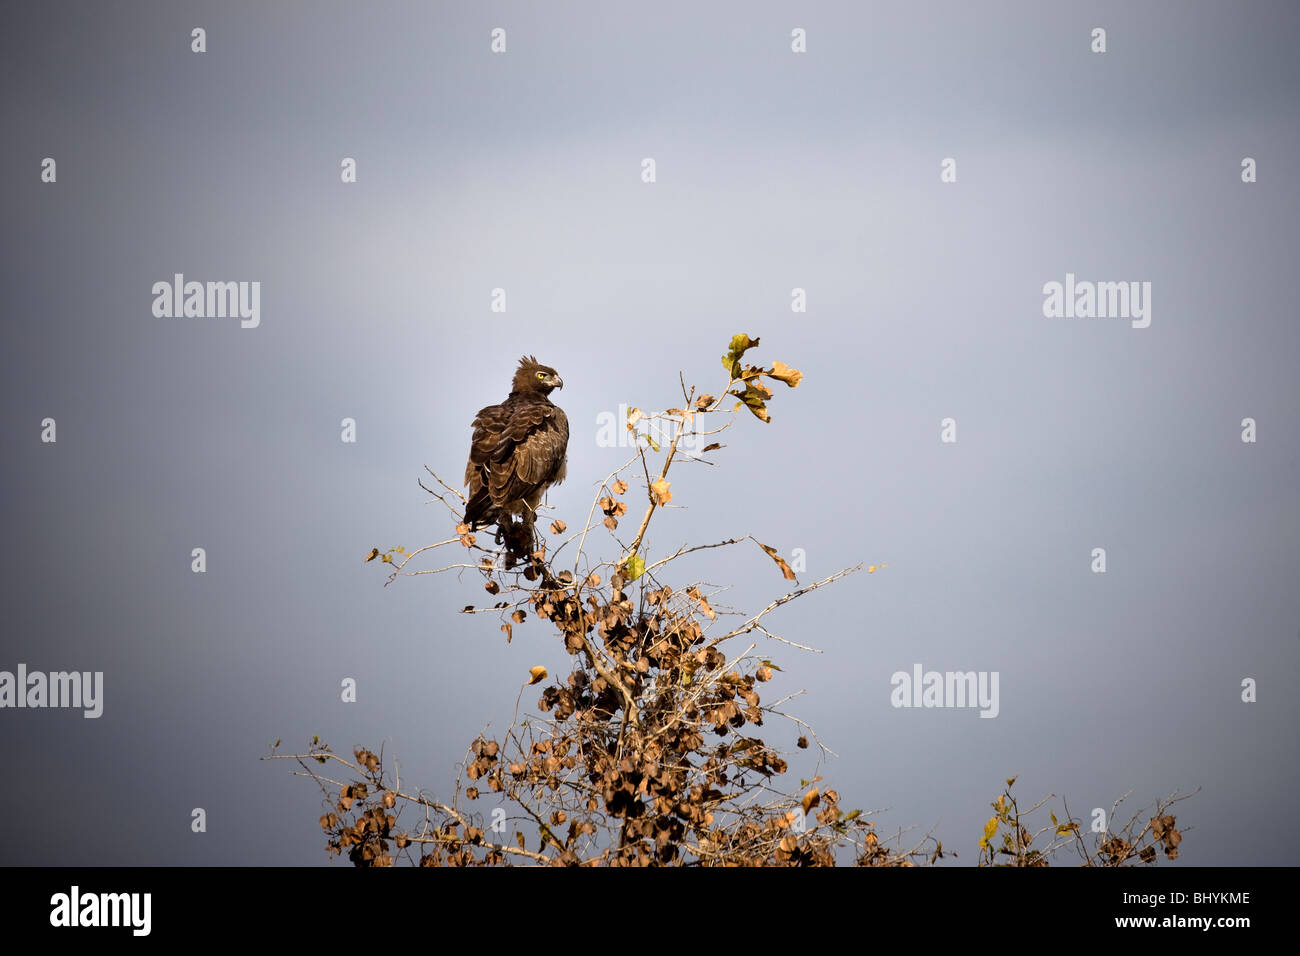 Martial Eagle, Mikumi NP, Tanzania, East Africa - Stock Image